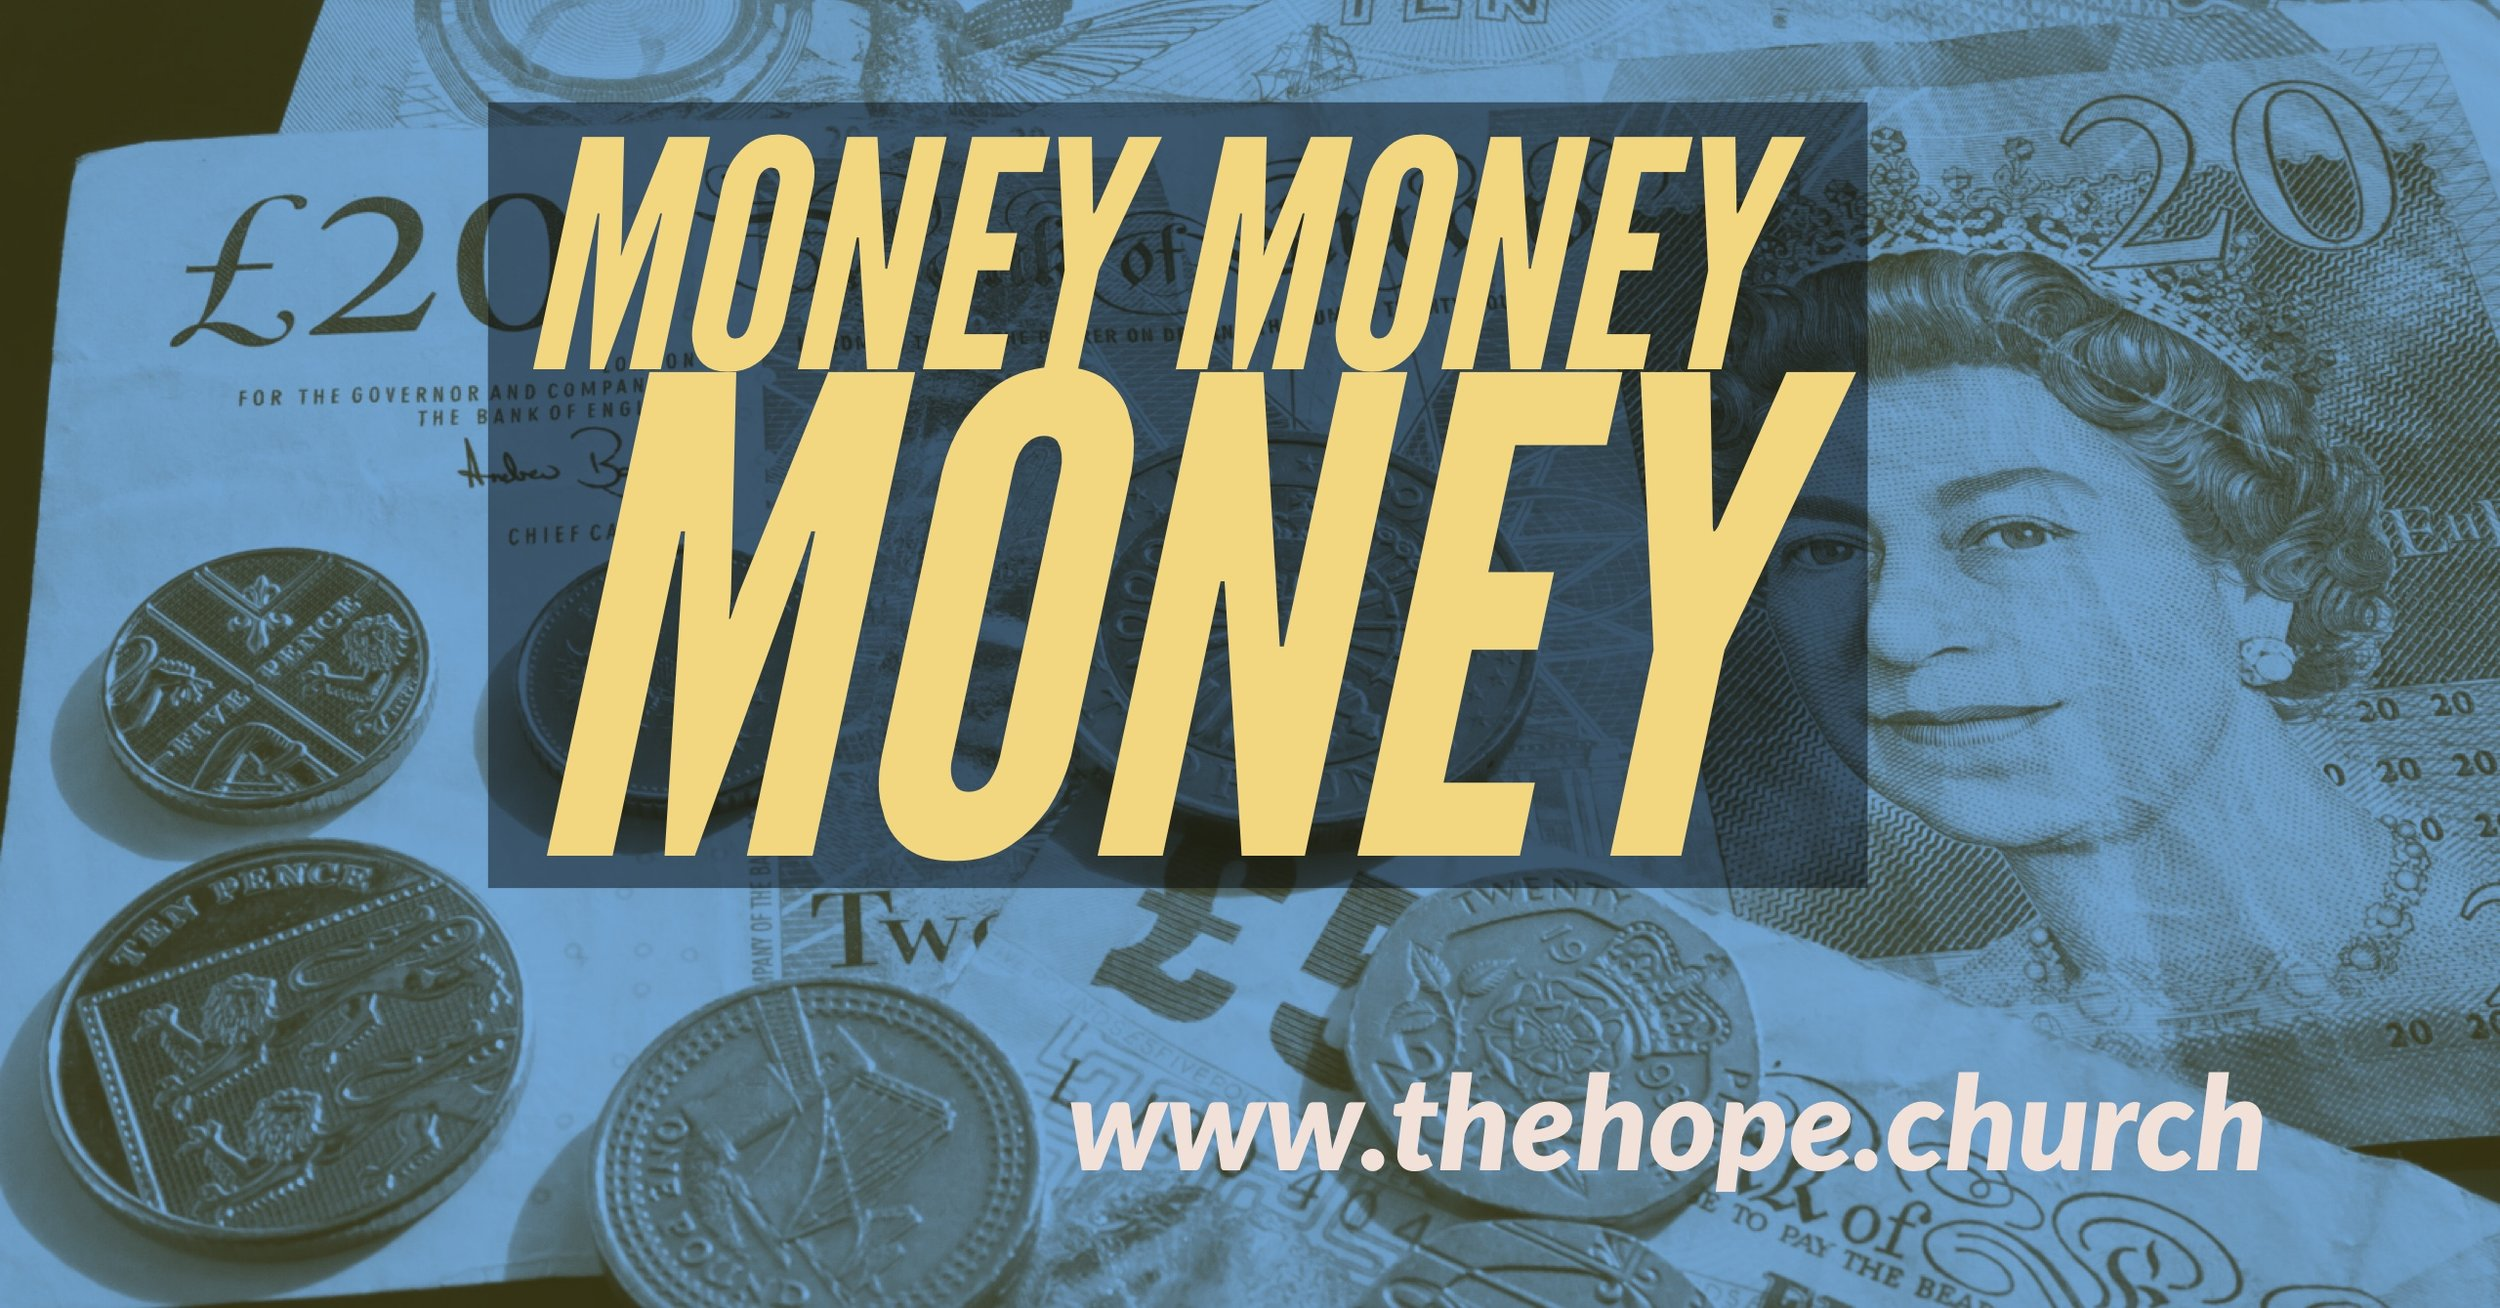 Money Money Money - a mini-series about money